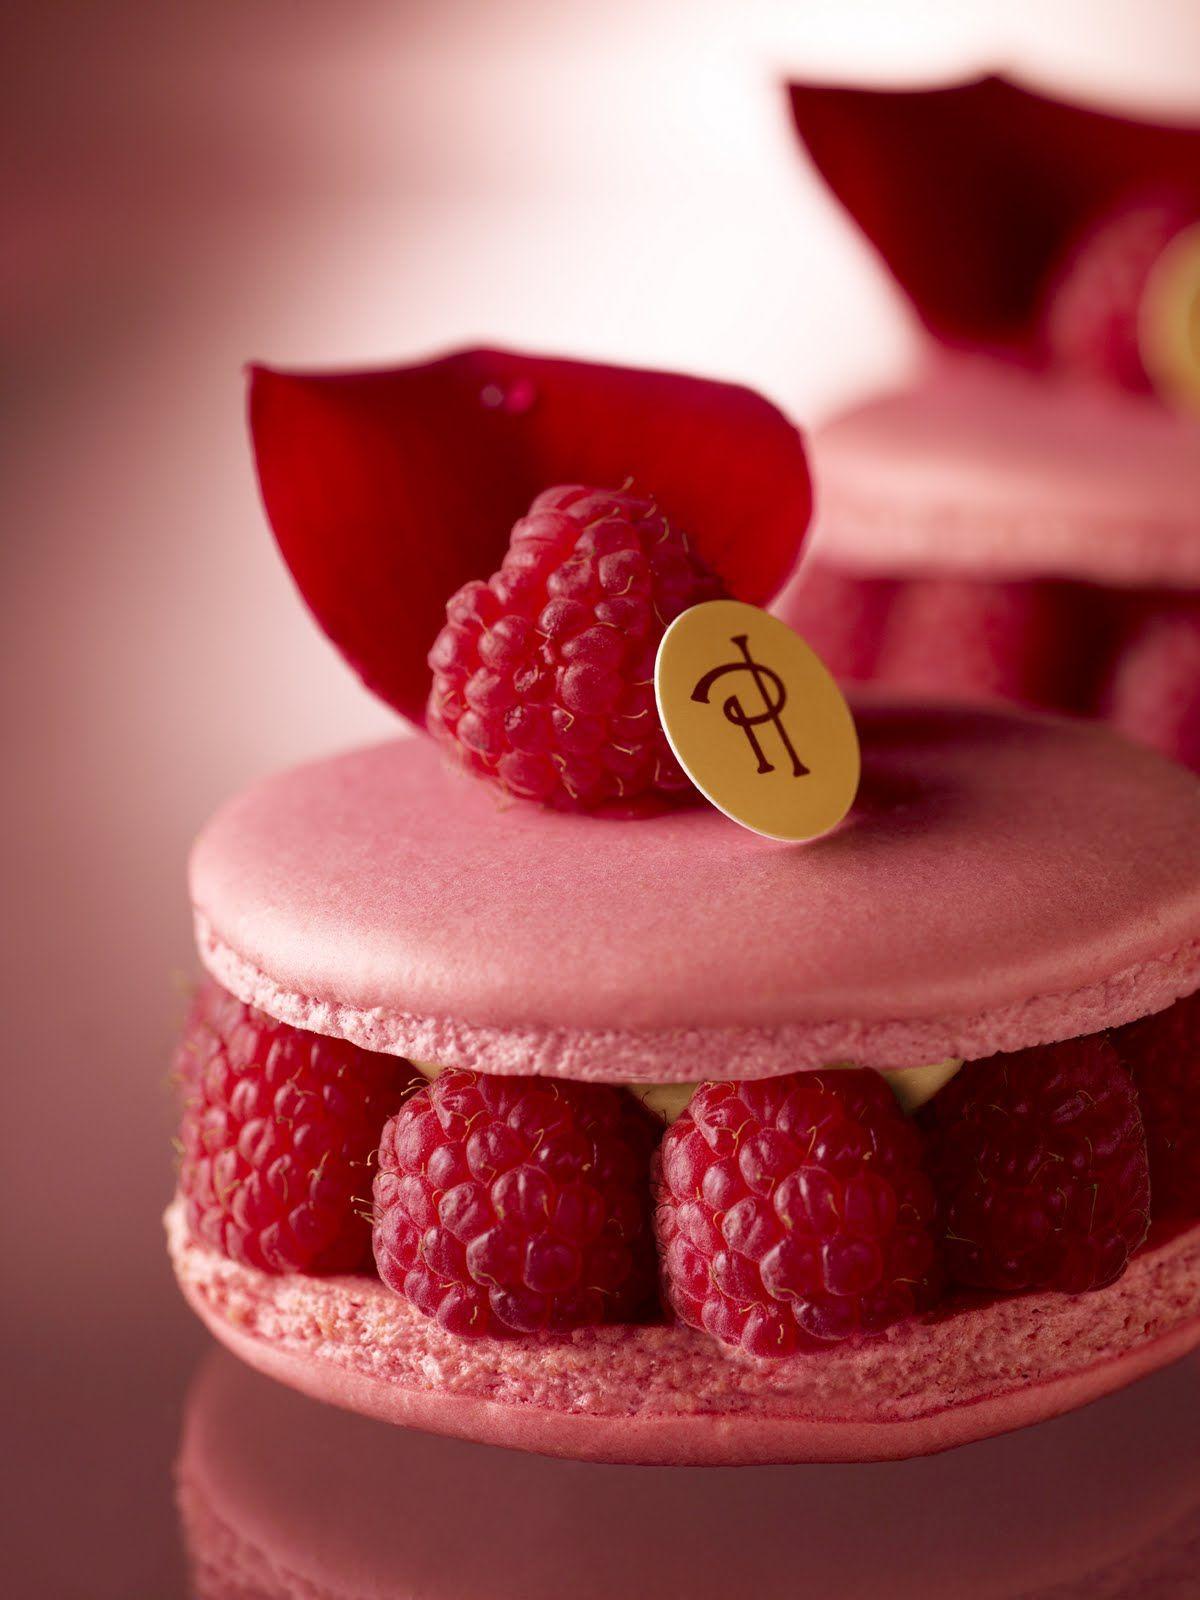 Pierre Herme, the Picasso of pastry Recette macaron, Macaron, Macaron framboise